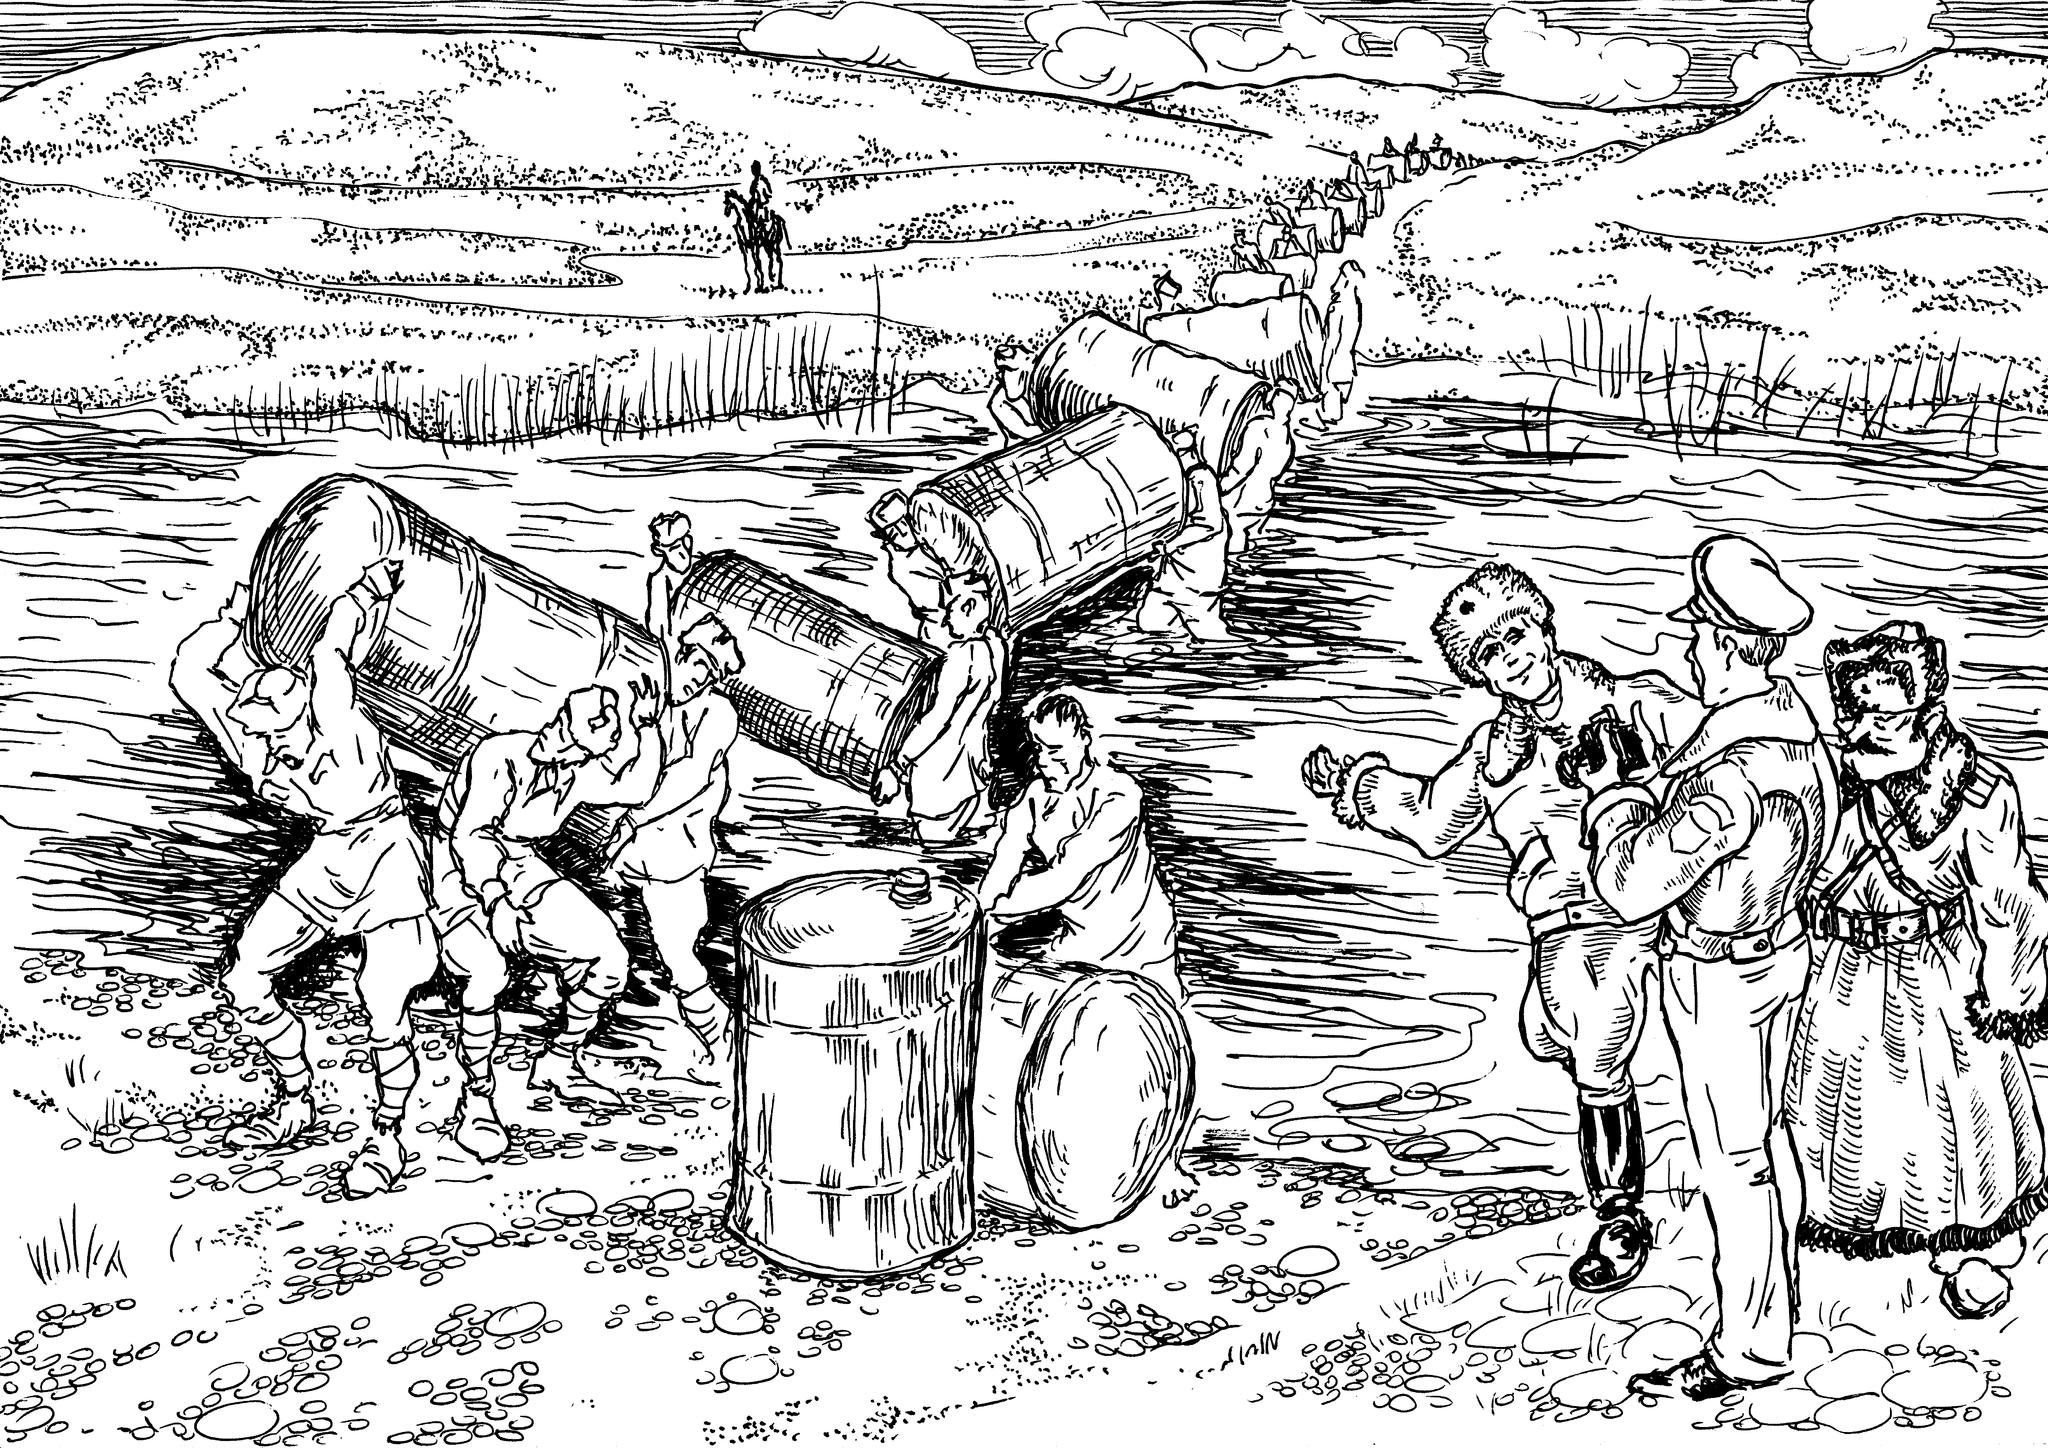 Разгрузка грузов ленд-лиза из Великобритании и США в условиях Русского Севера